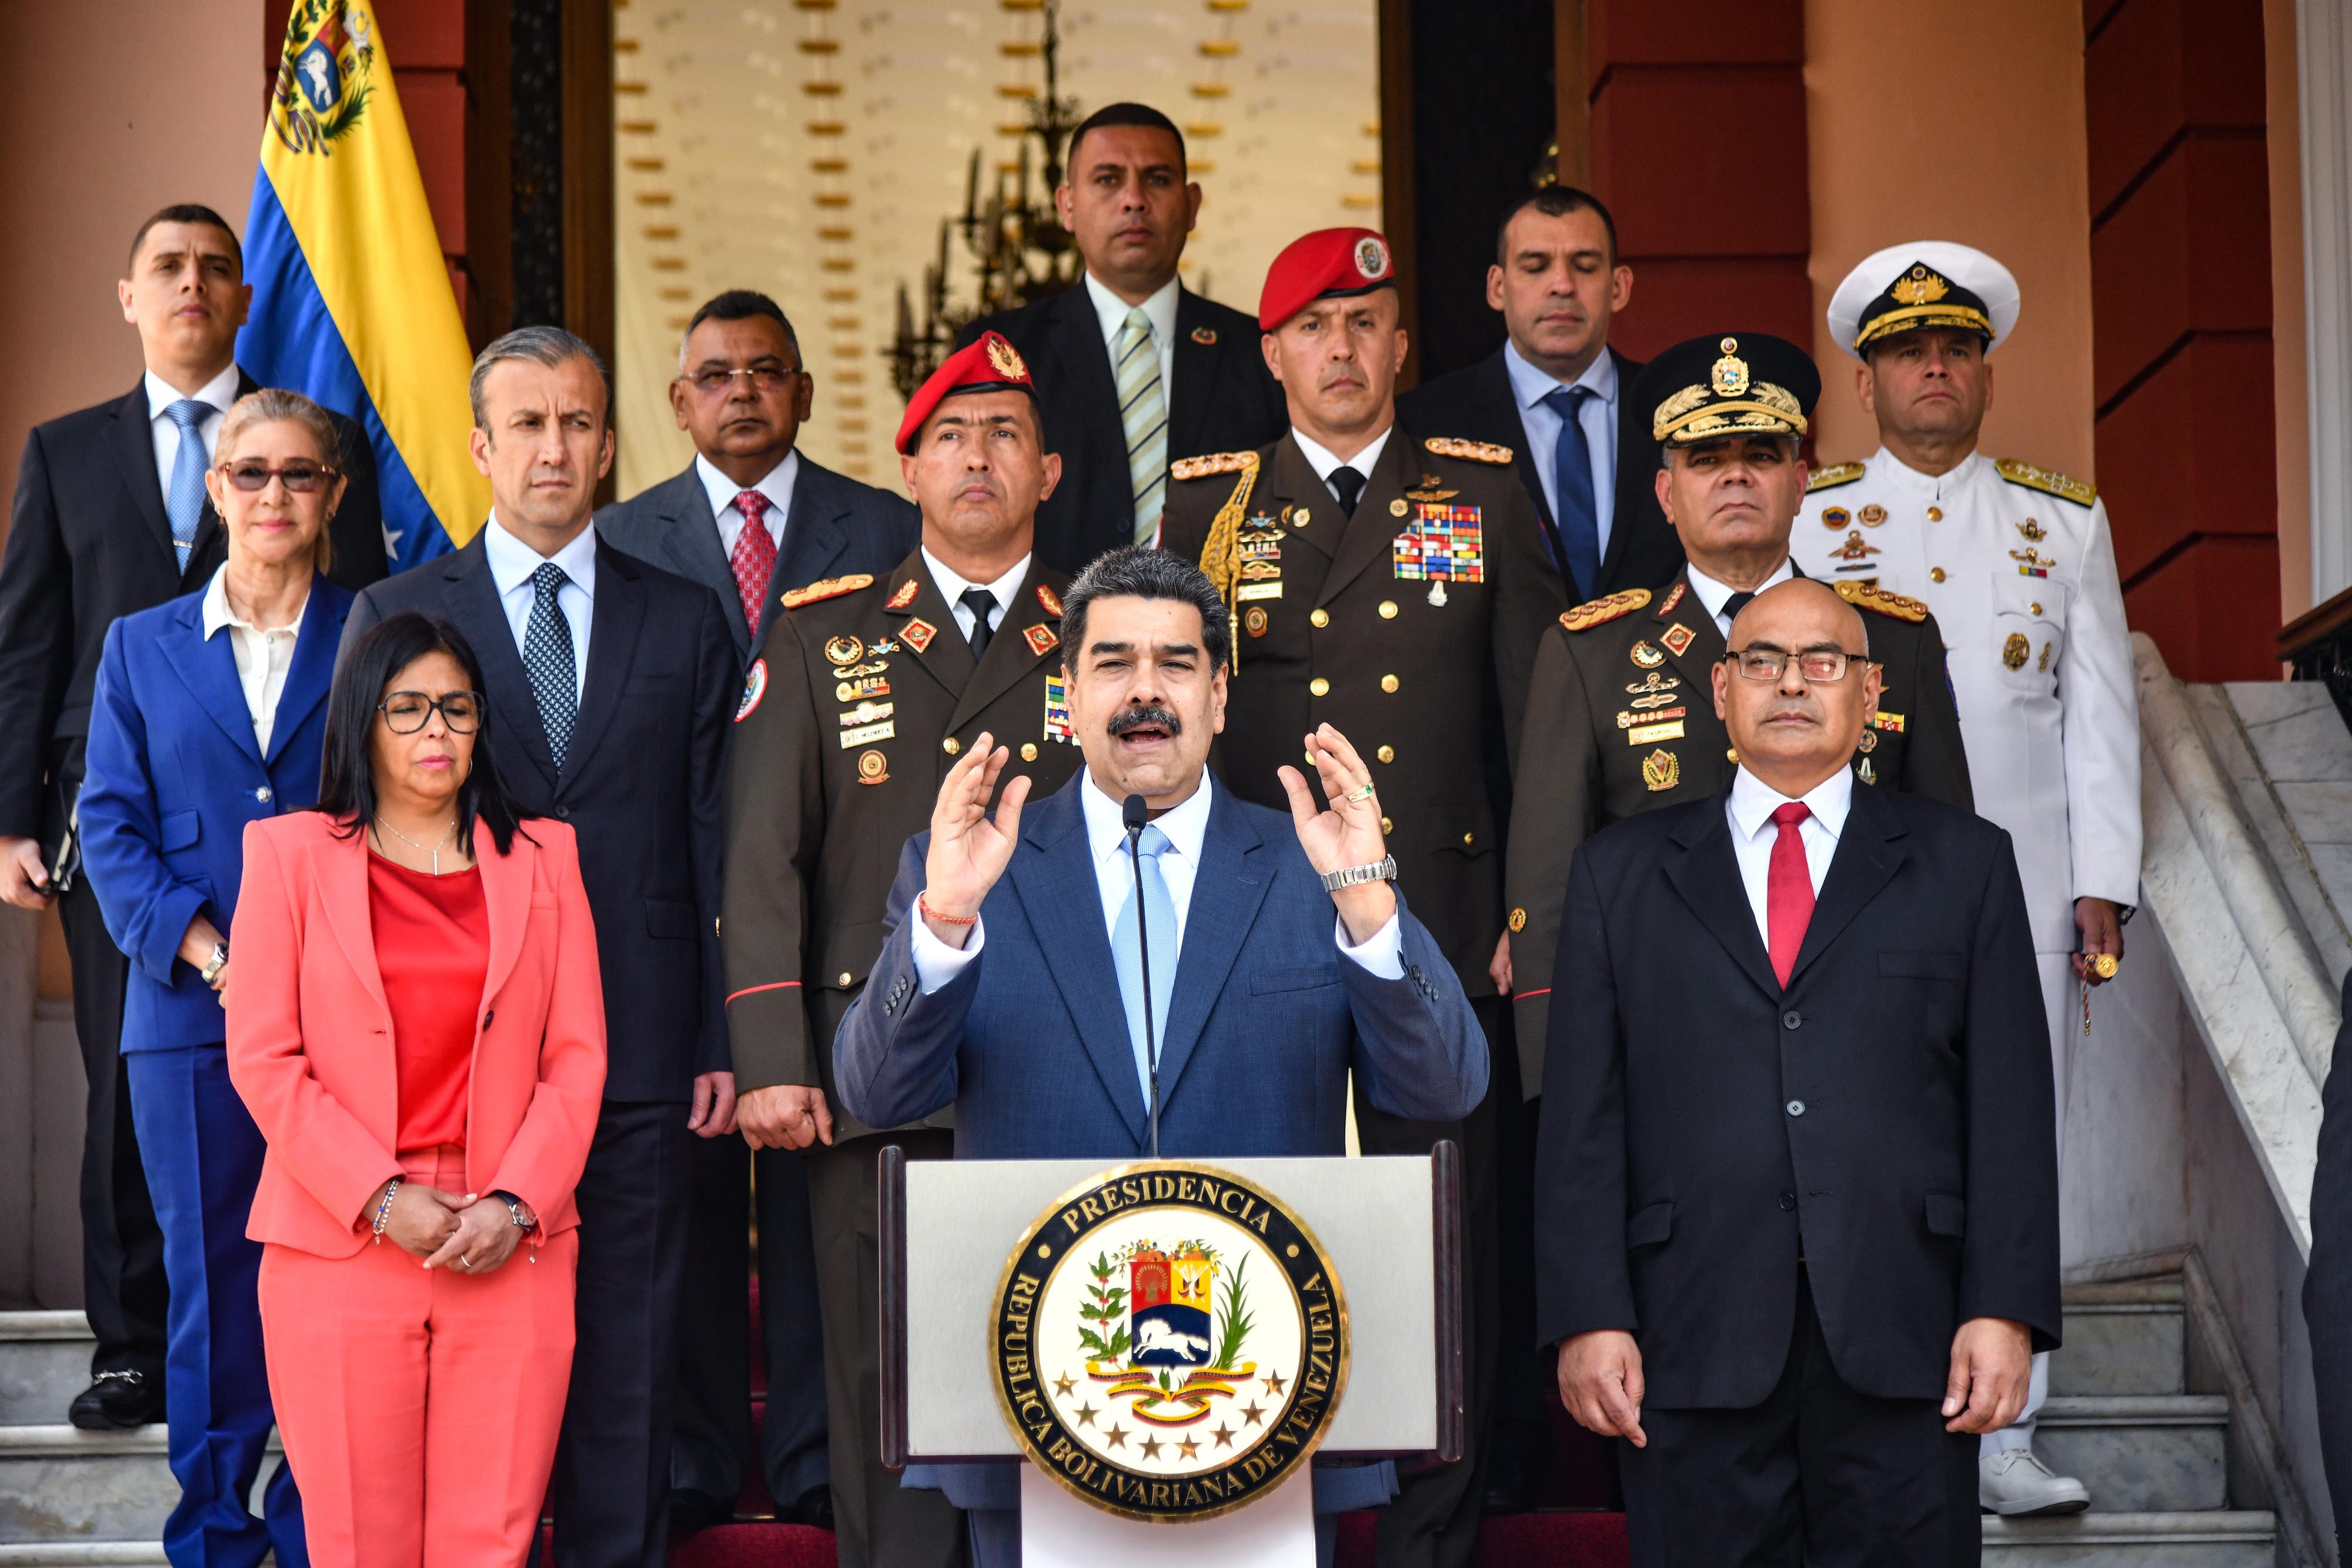 US Outlines Plan for Venezuela Transition, Sanctions Relief